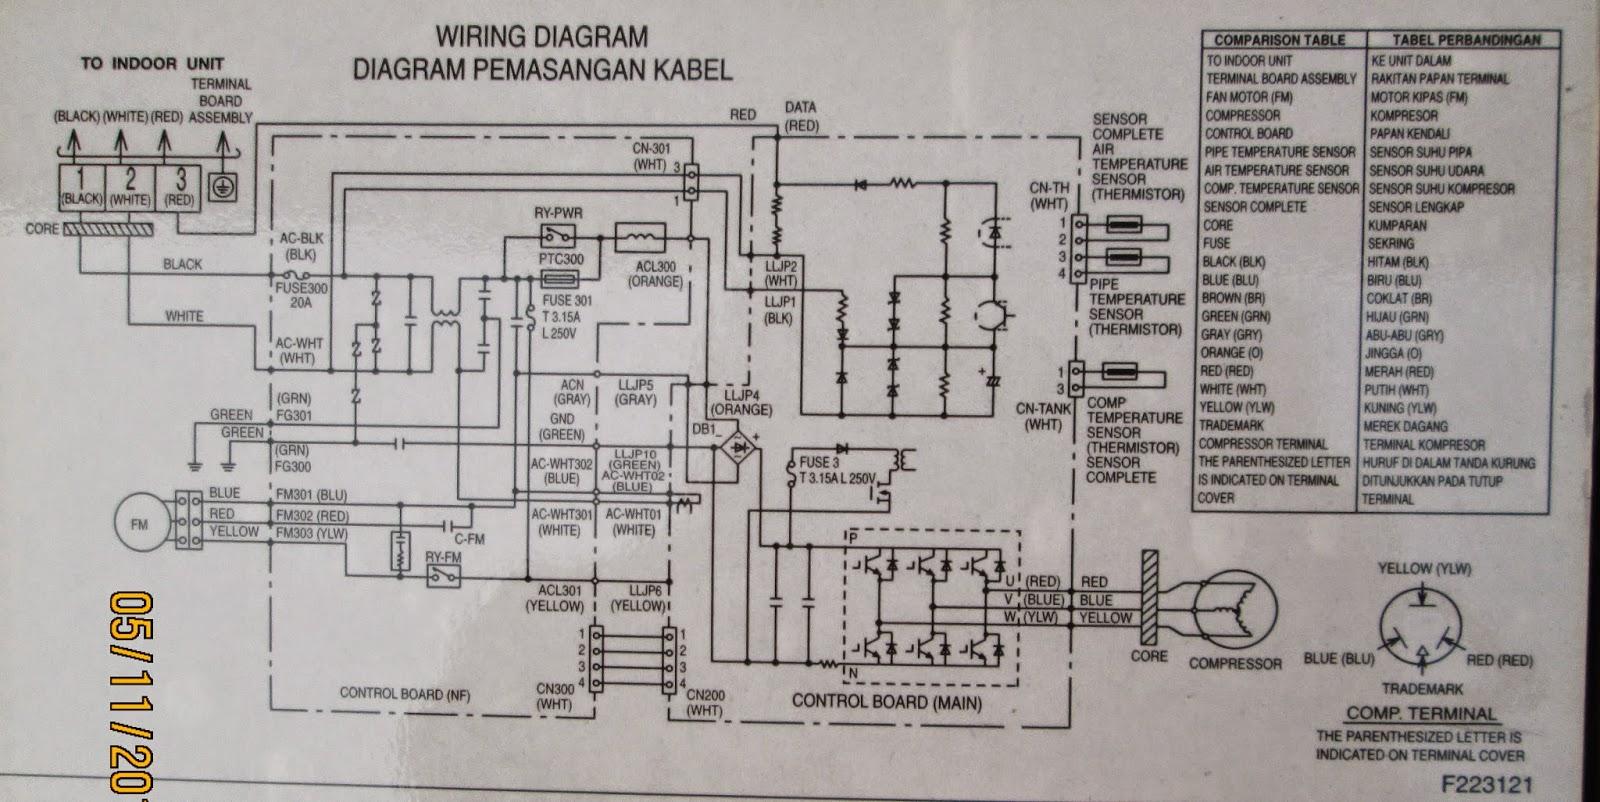 Service ac kota serang baru diagram kelistrikan ac split outdoor panasonic inverter asfbconference2016 Image collections